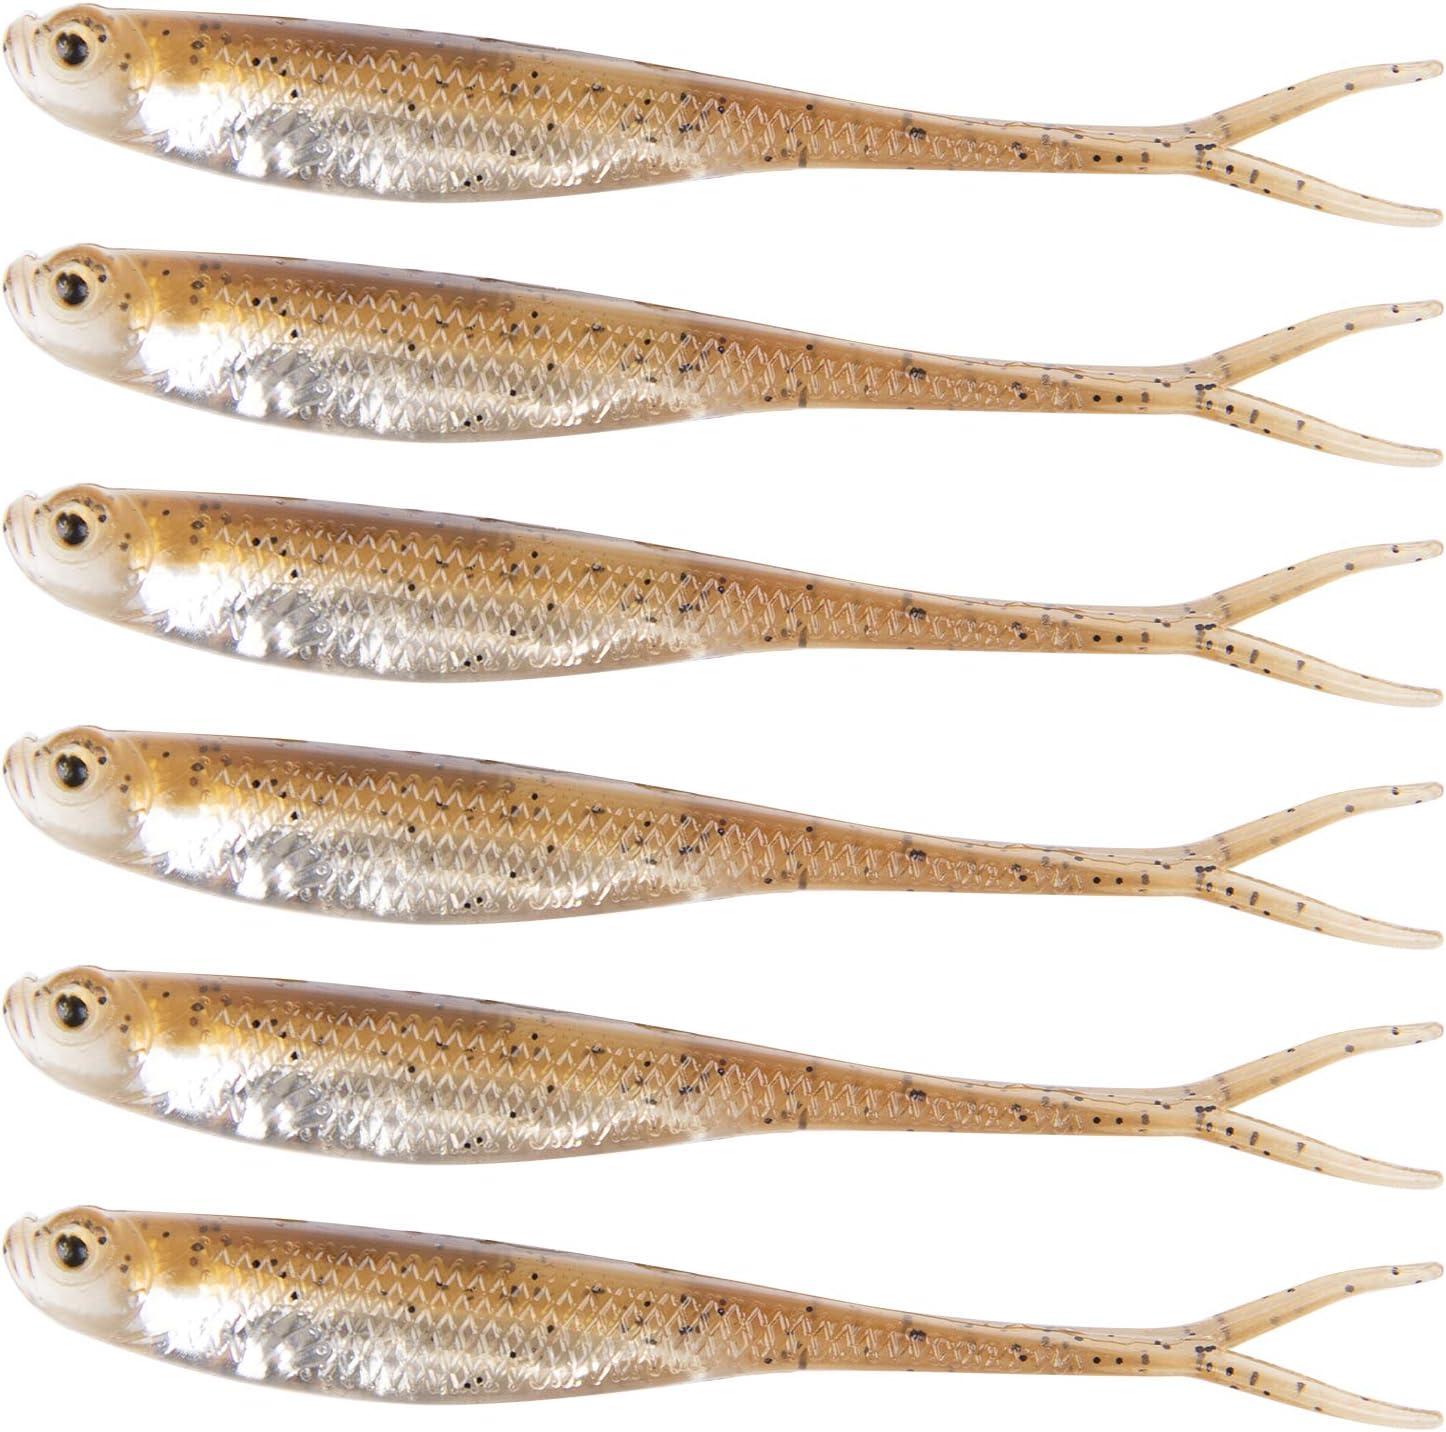 "Select Nimfa 1,6/"" Rubber Fish Rubber Bait softbait creature bait Fishing Bait"